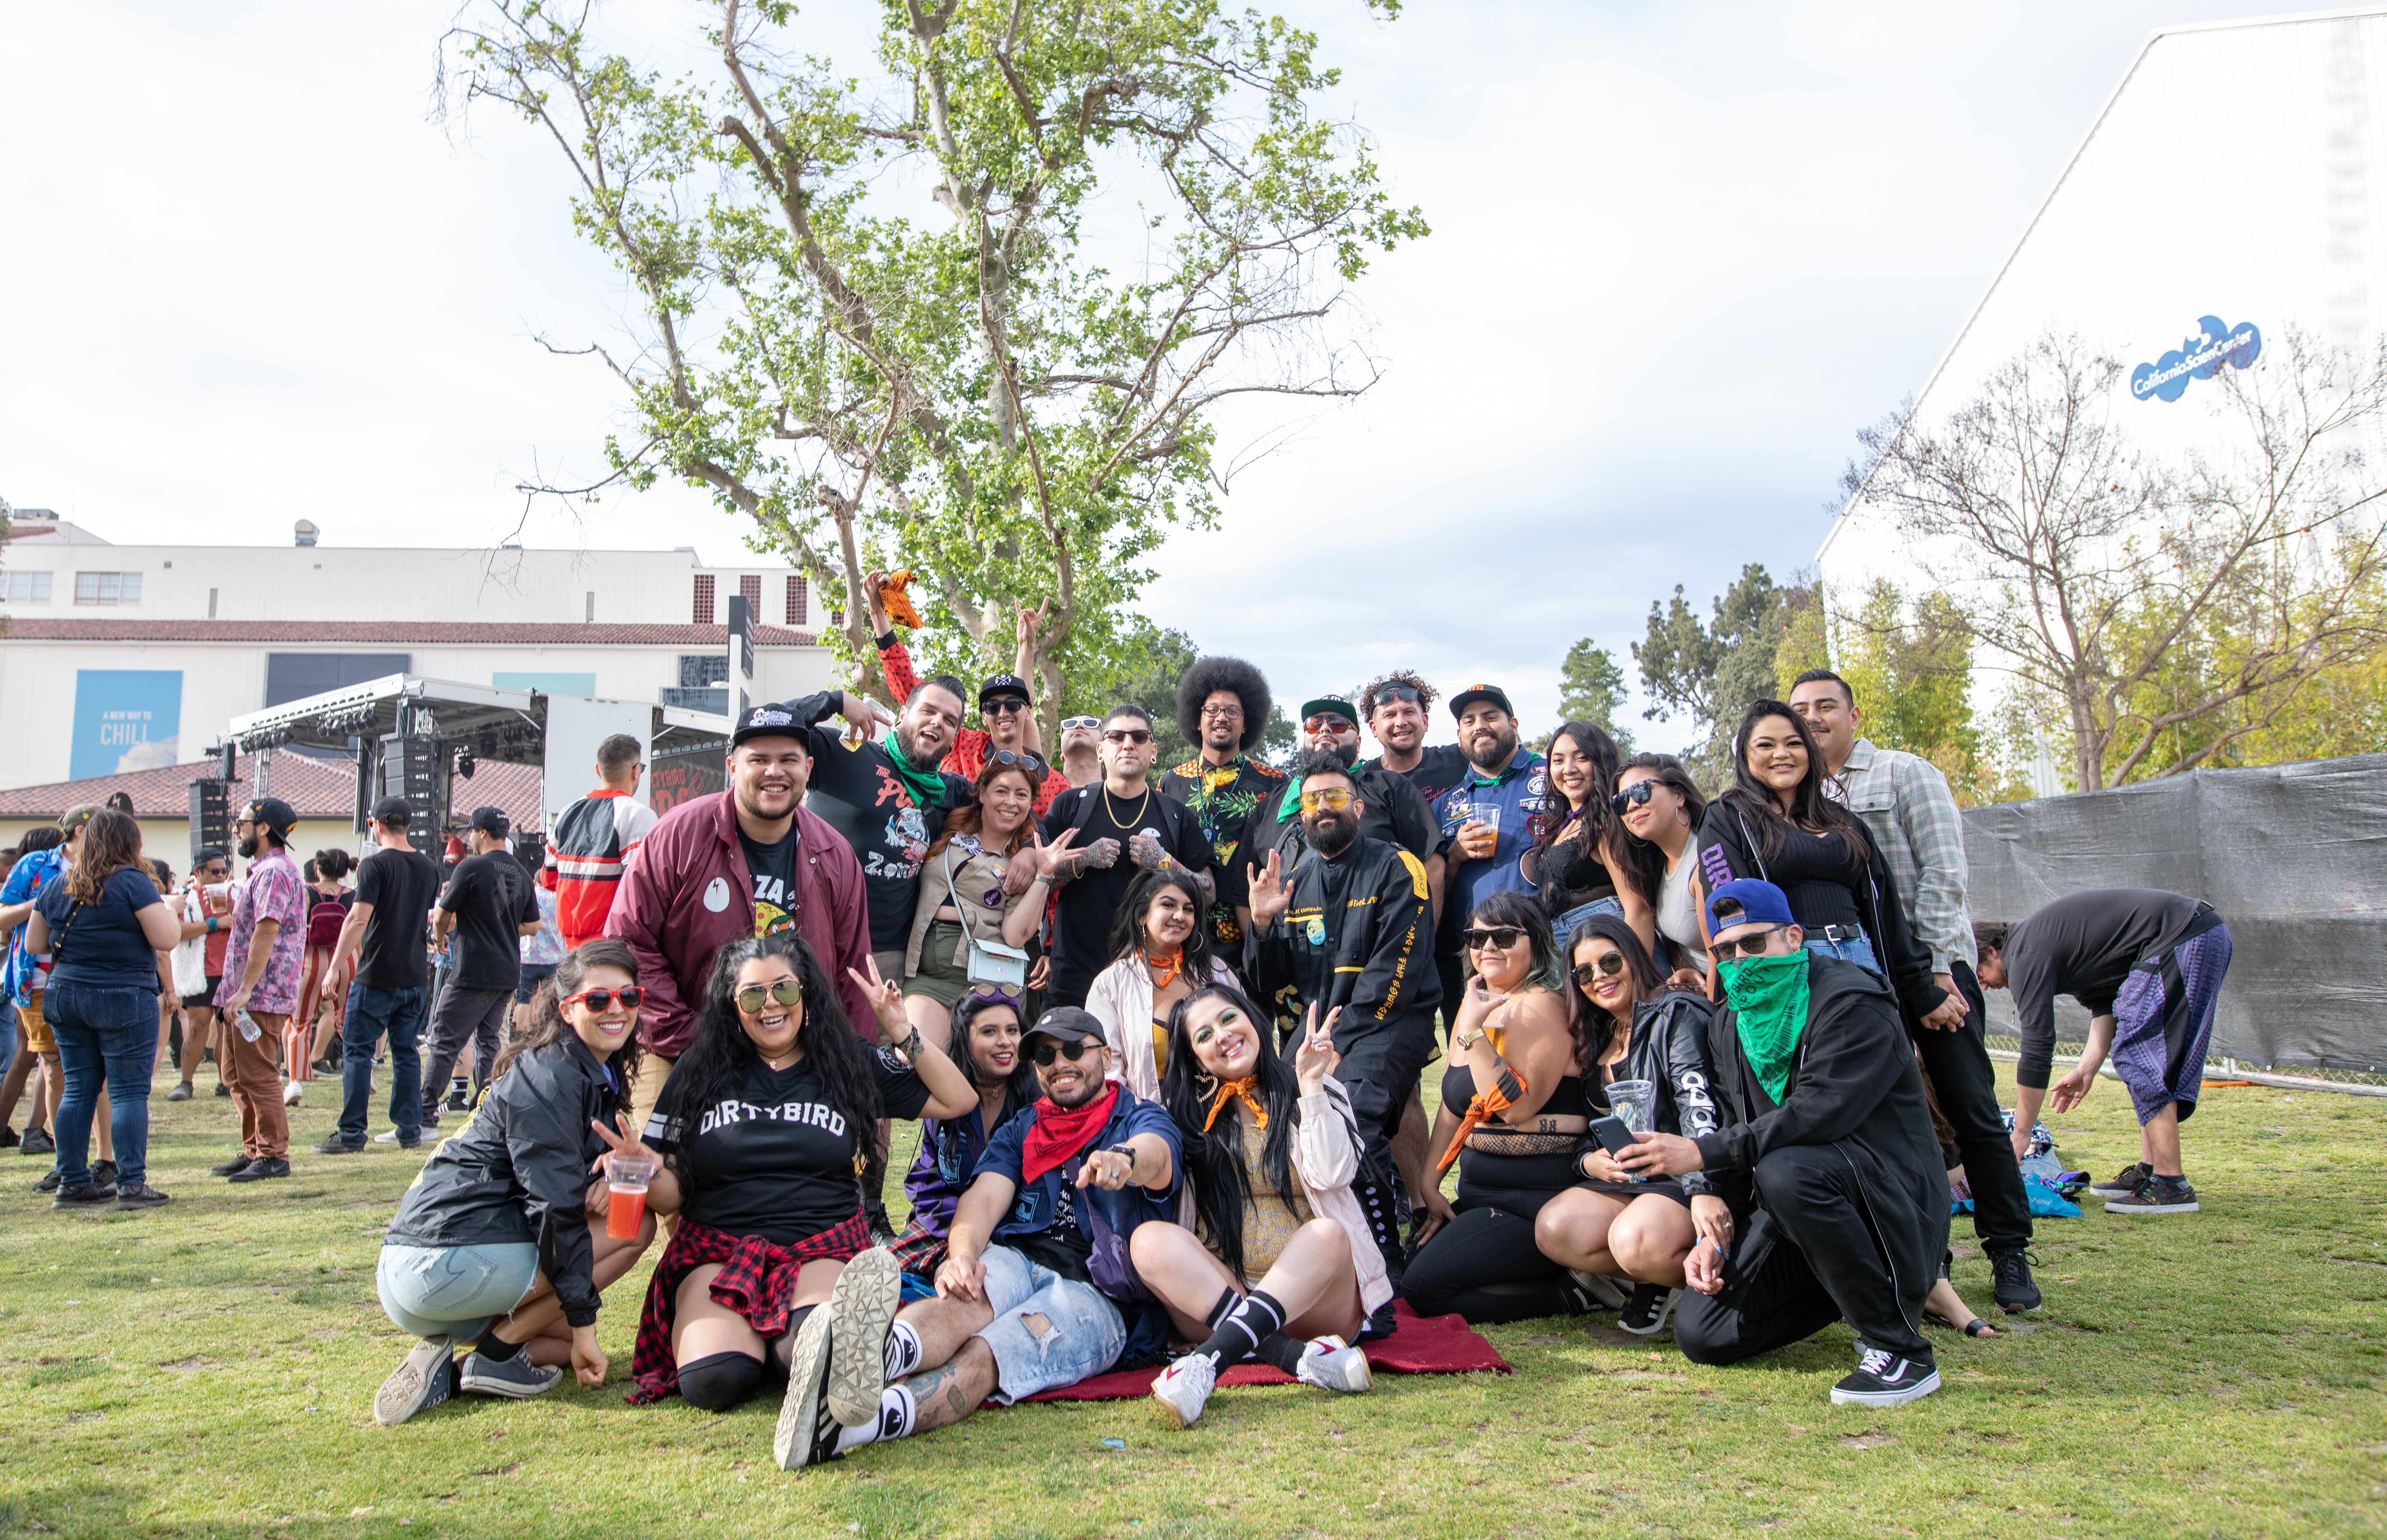 Dirtybird BBQ LA: Event Recap